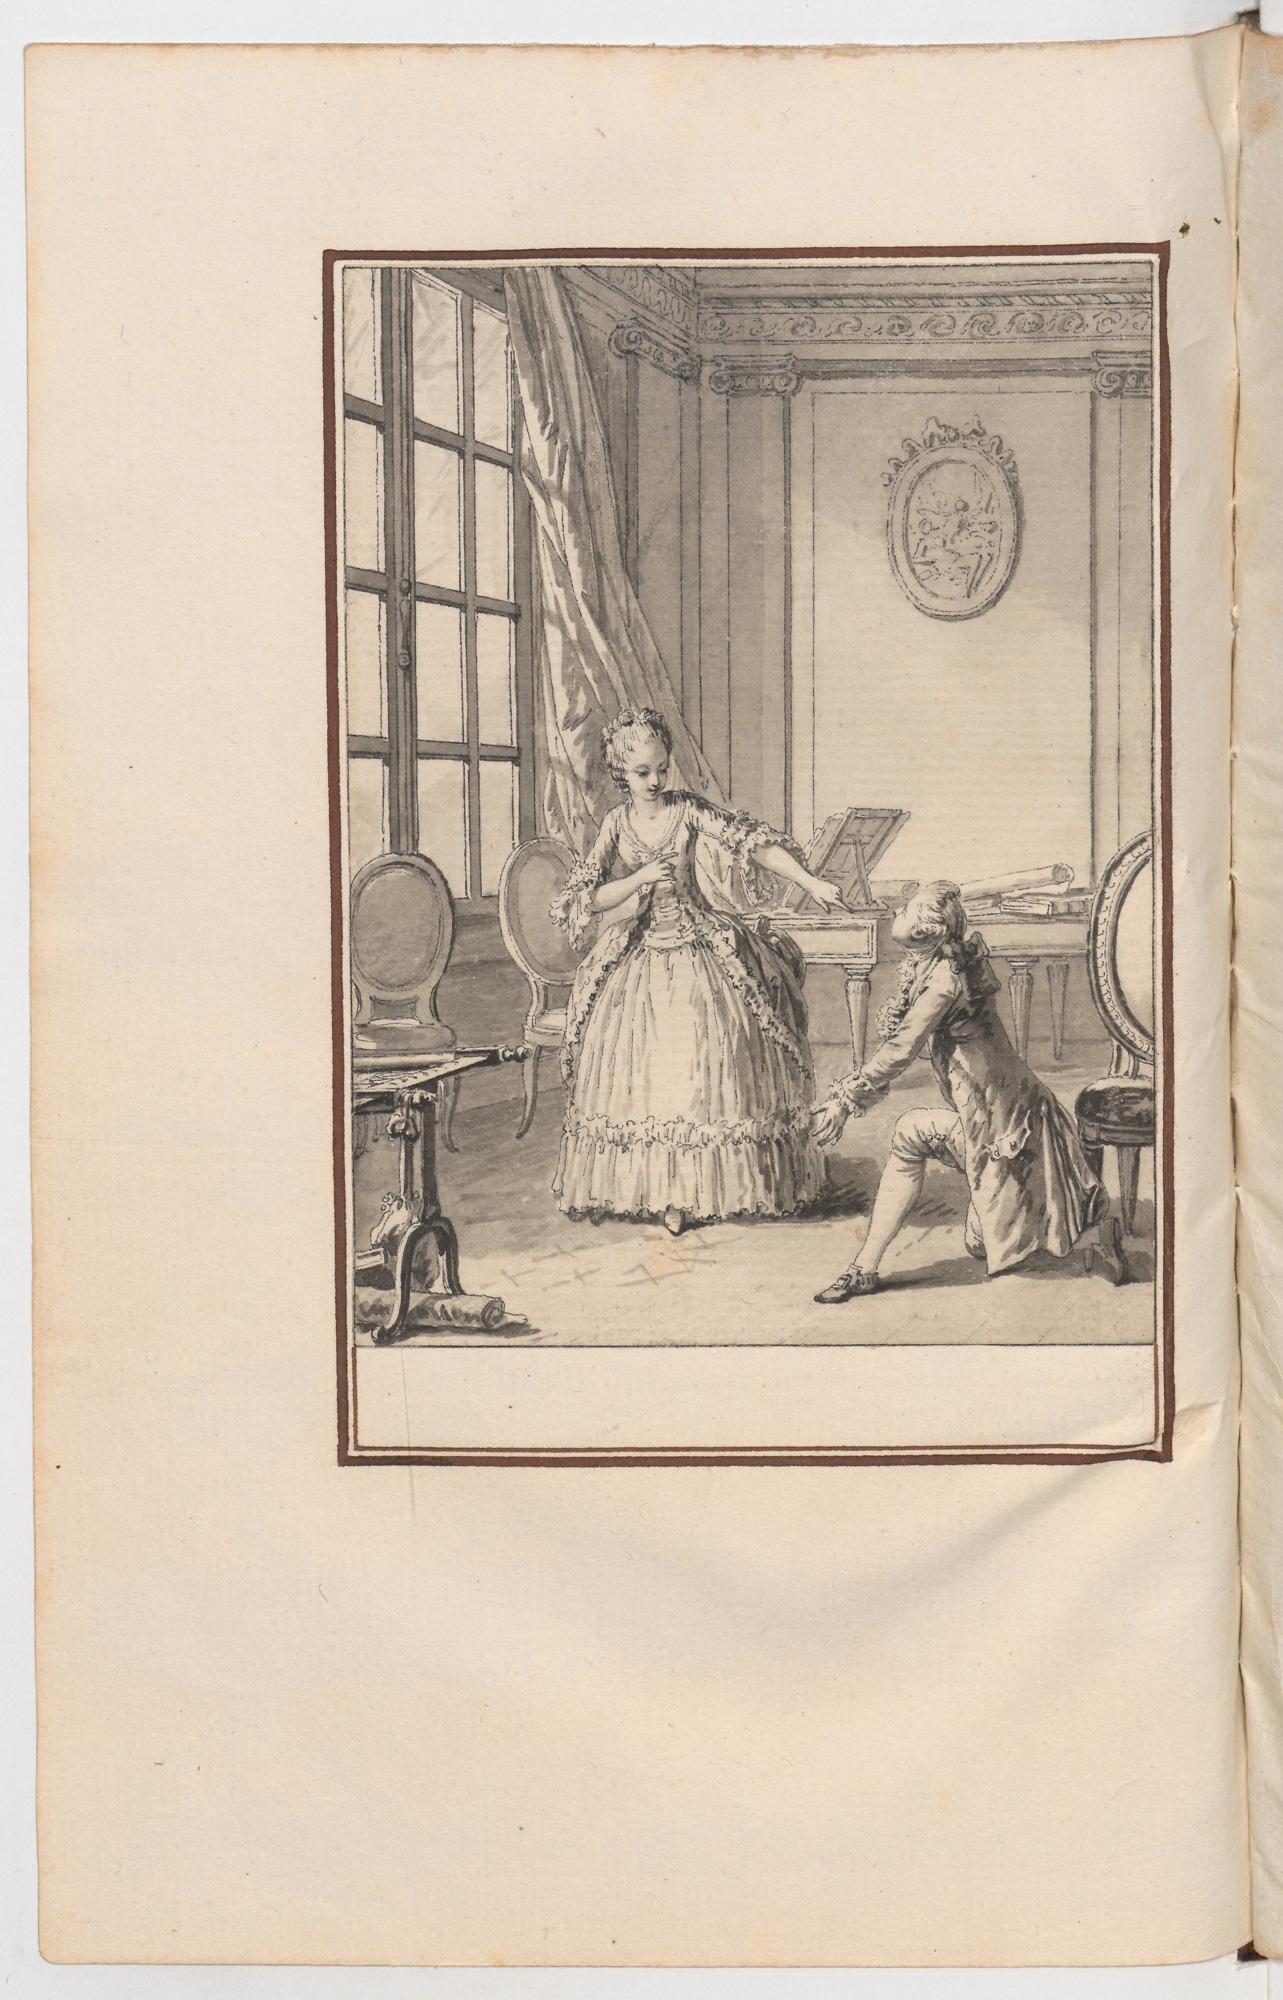 S.4.16 La capricieuse, Chantilly, Image